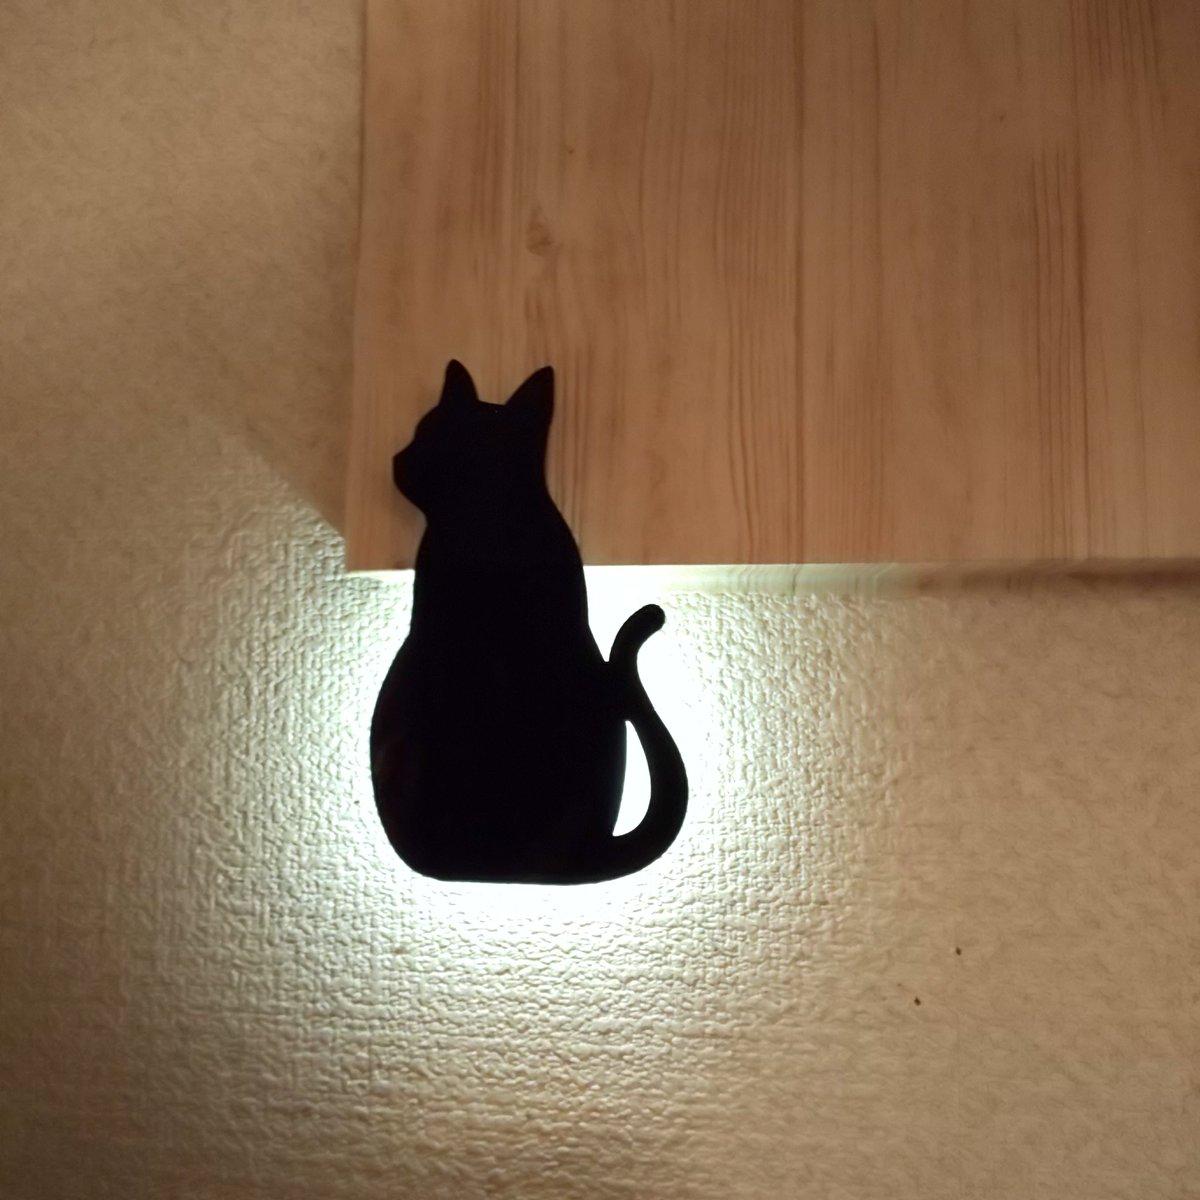 test ツイッターメディア - セリアで見つけた黒猫💕  #100均 #セリア #黒猫 https://t.co/rdMPVdmvnz